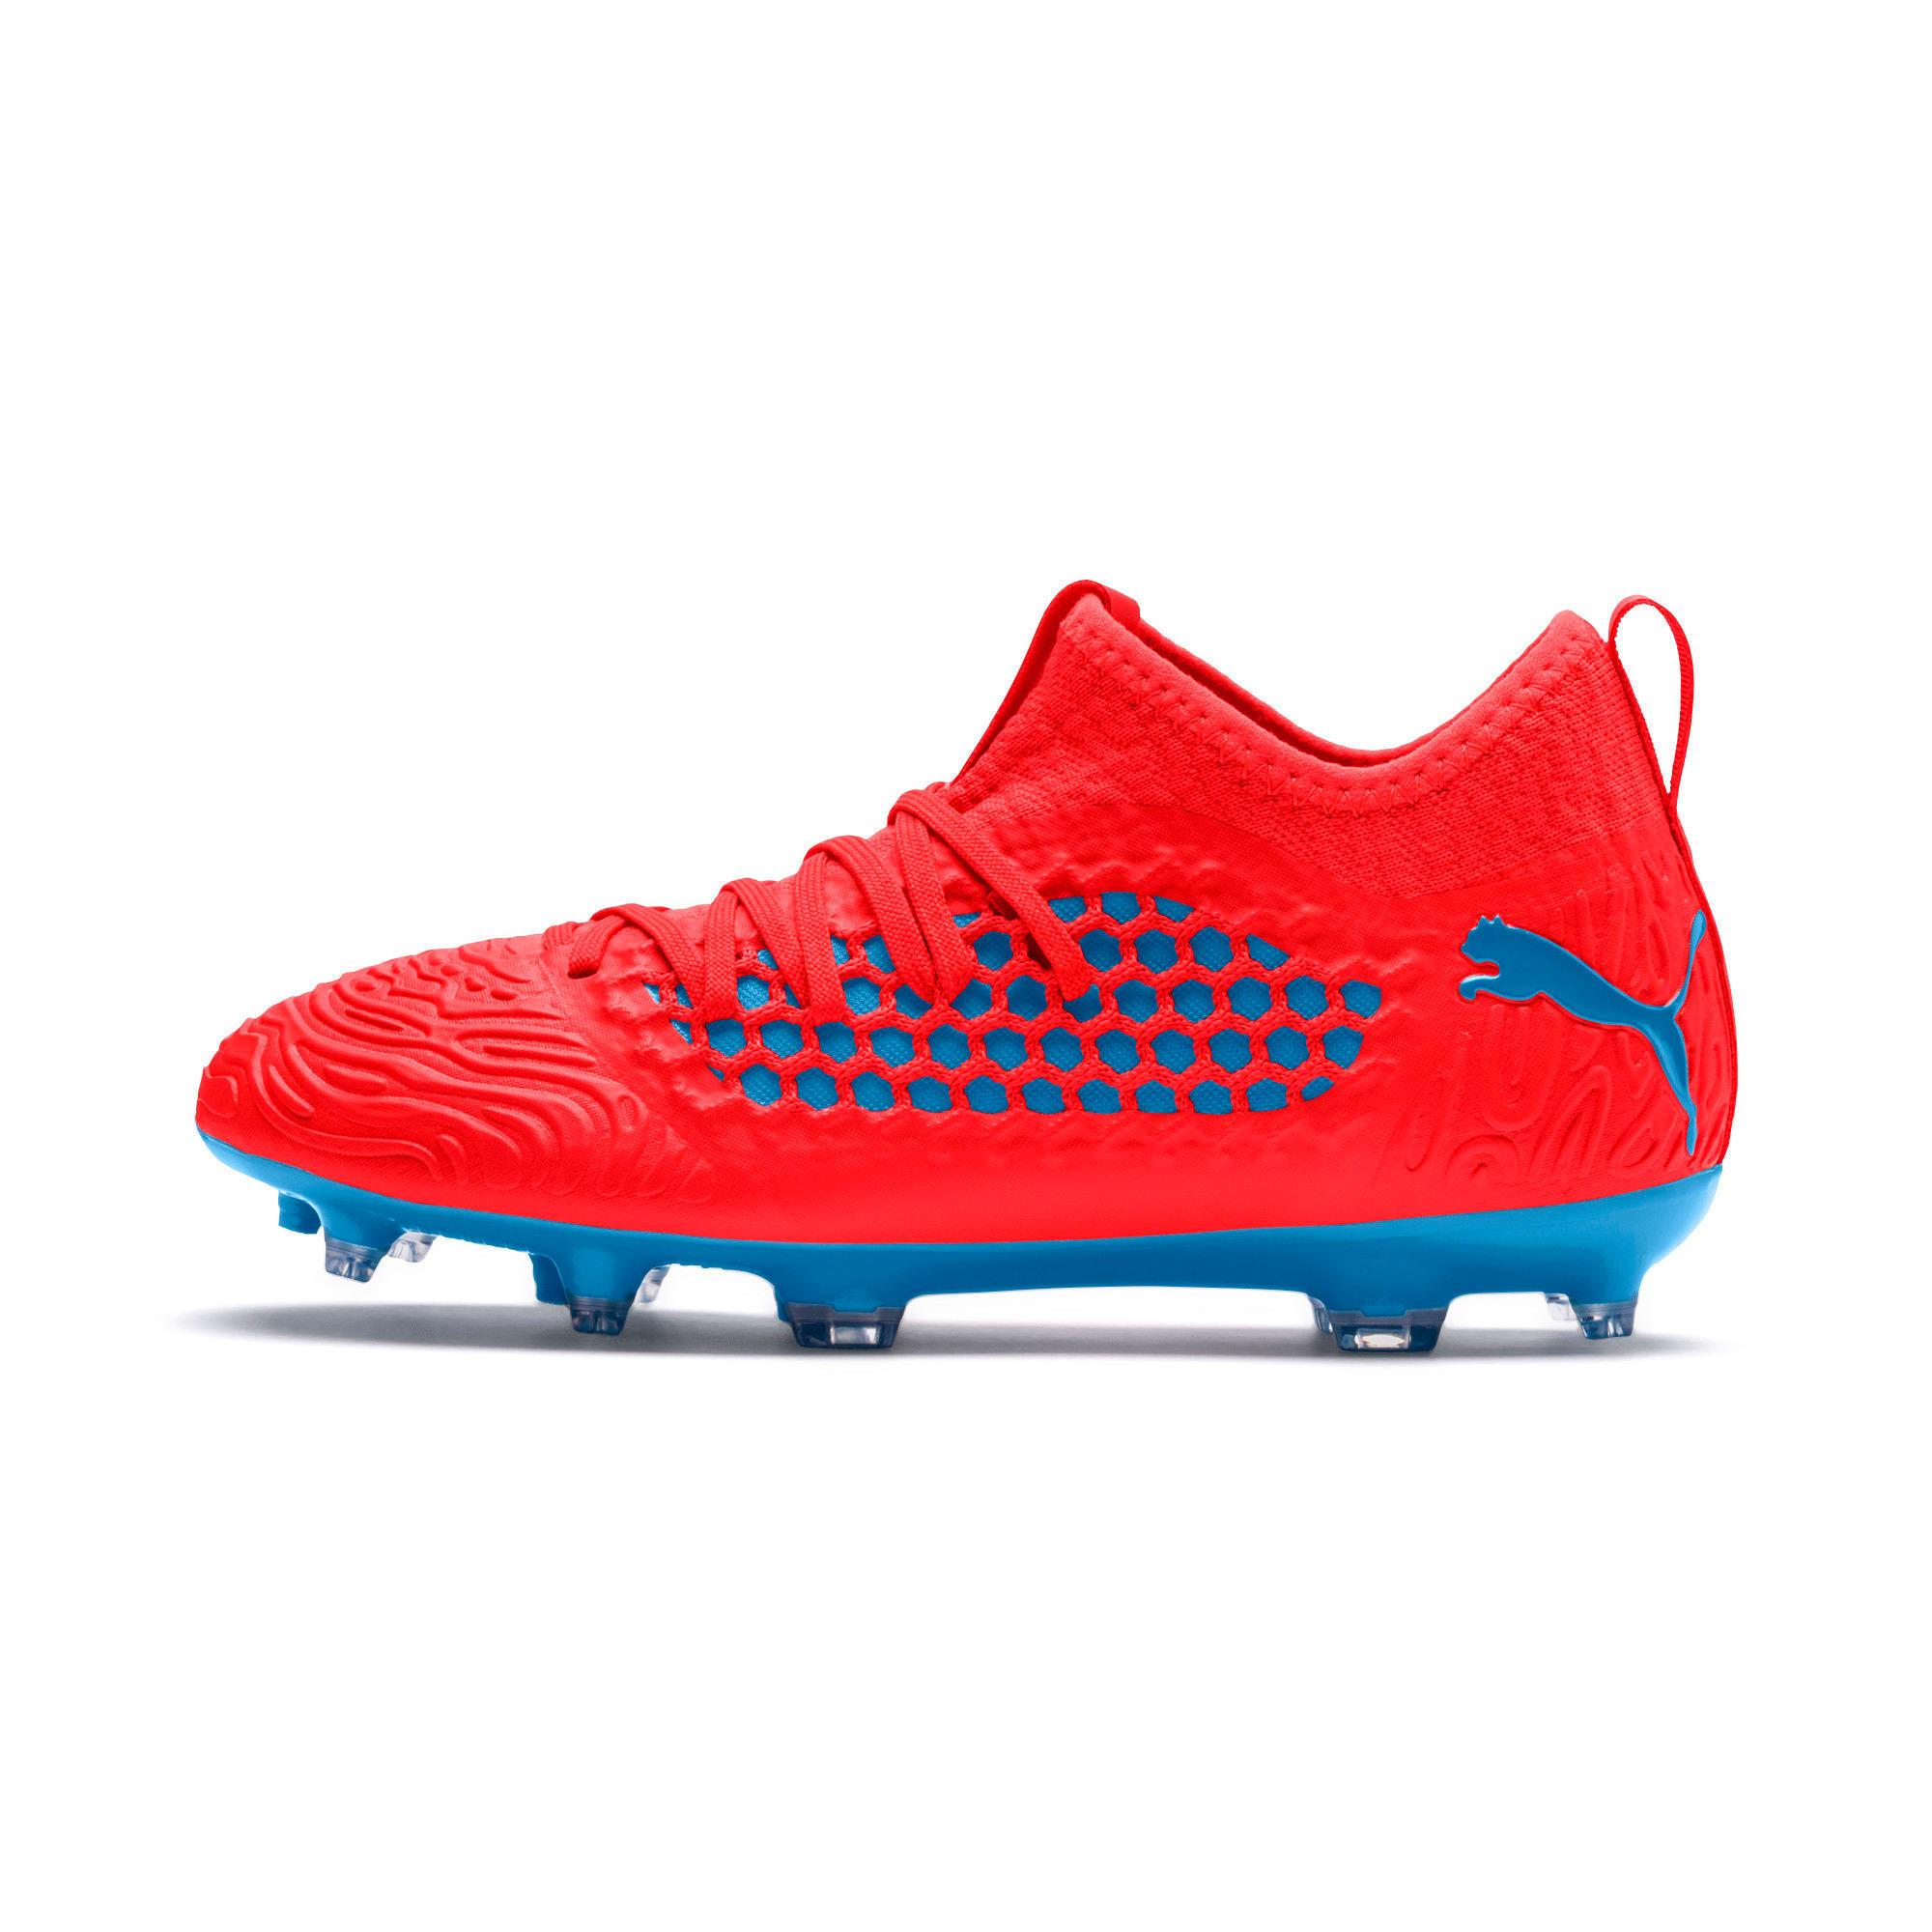 Thumbnail 1 of FUTURE 19.3 NETFIT FG/AG Soccer Cleats JR, Red Blast-Bleu Azur, medium